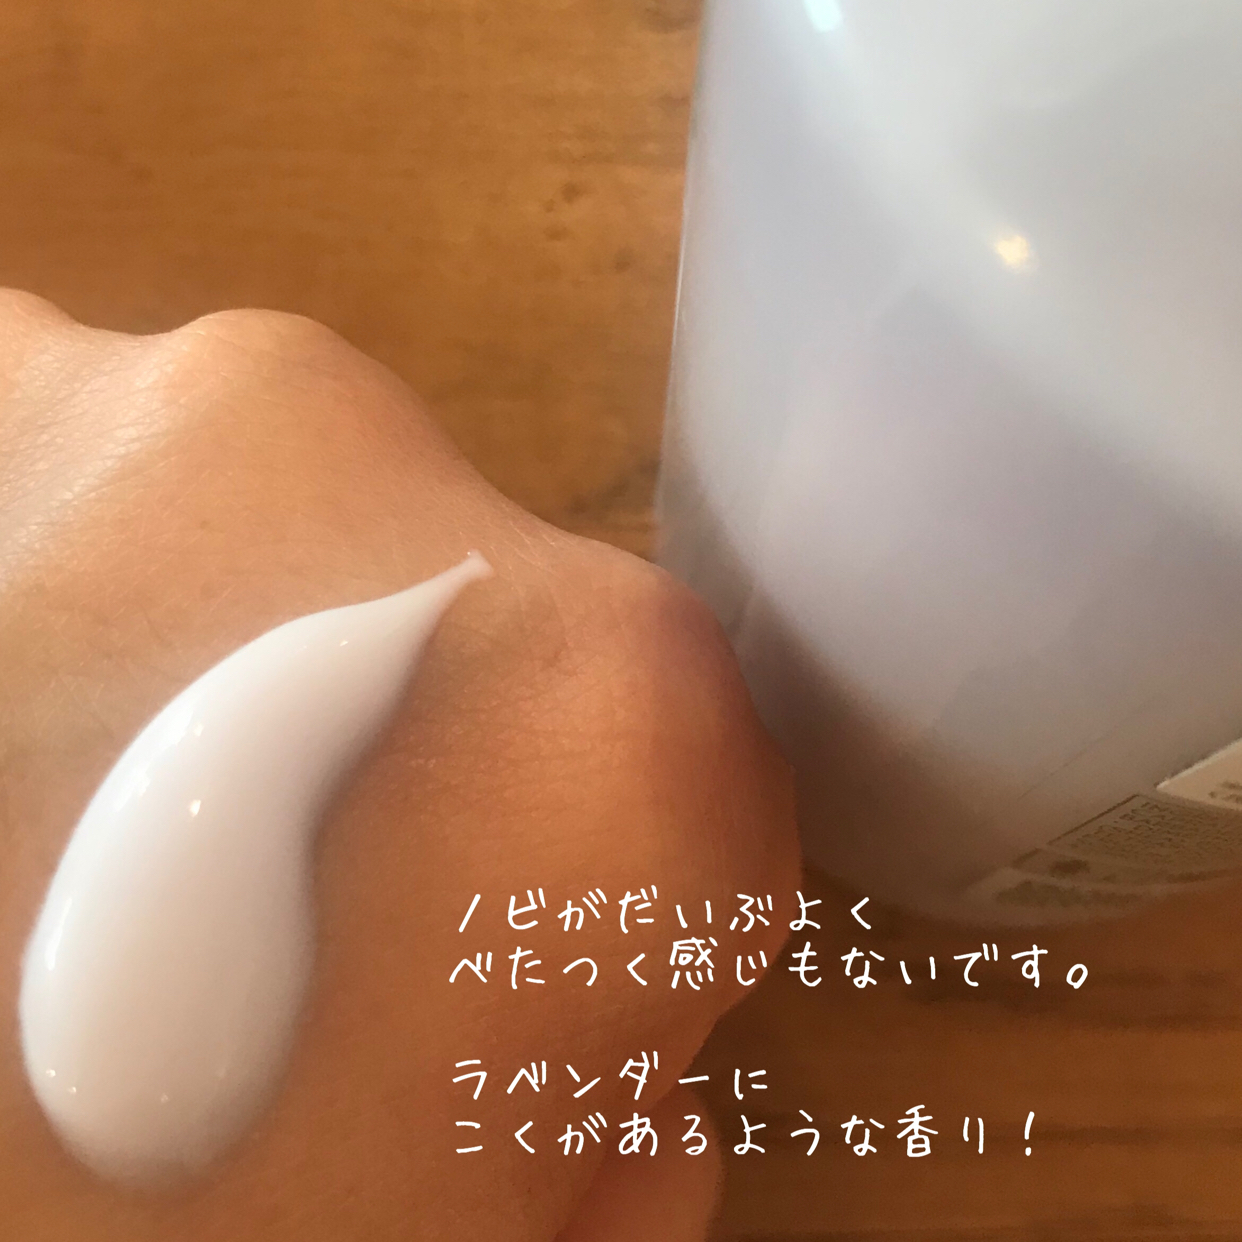 YVES ROCHER ボディローション ラベンダー&ブラックベリー(ボディローション・ミルク)を使ったクチコミ(2枚目)